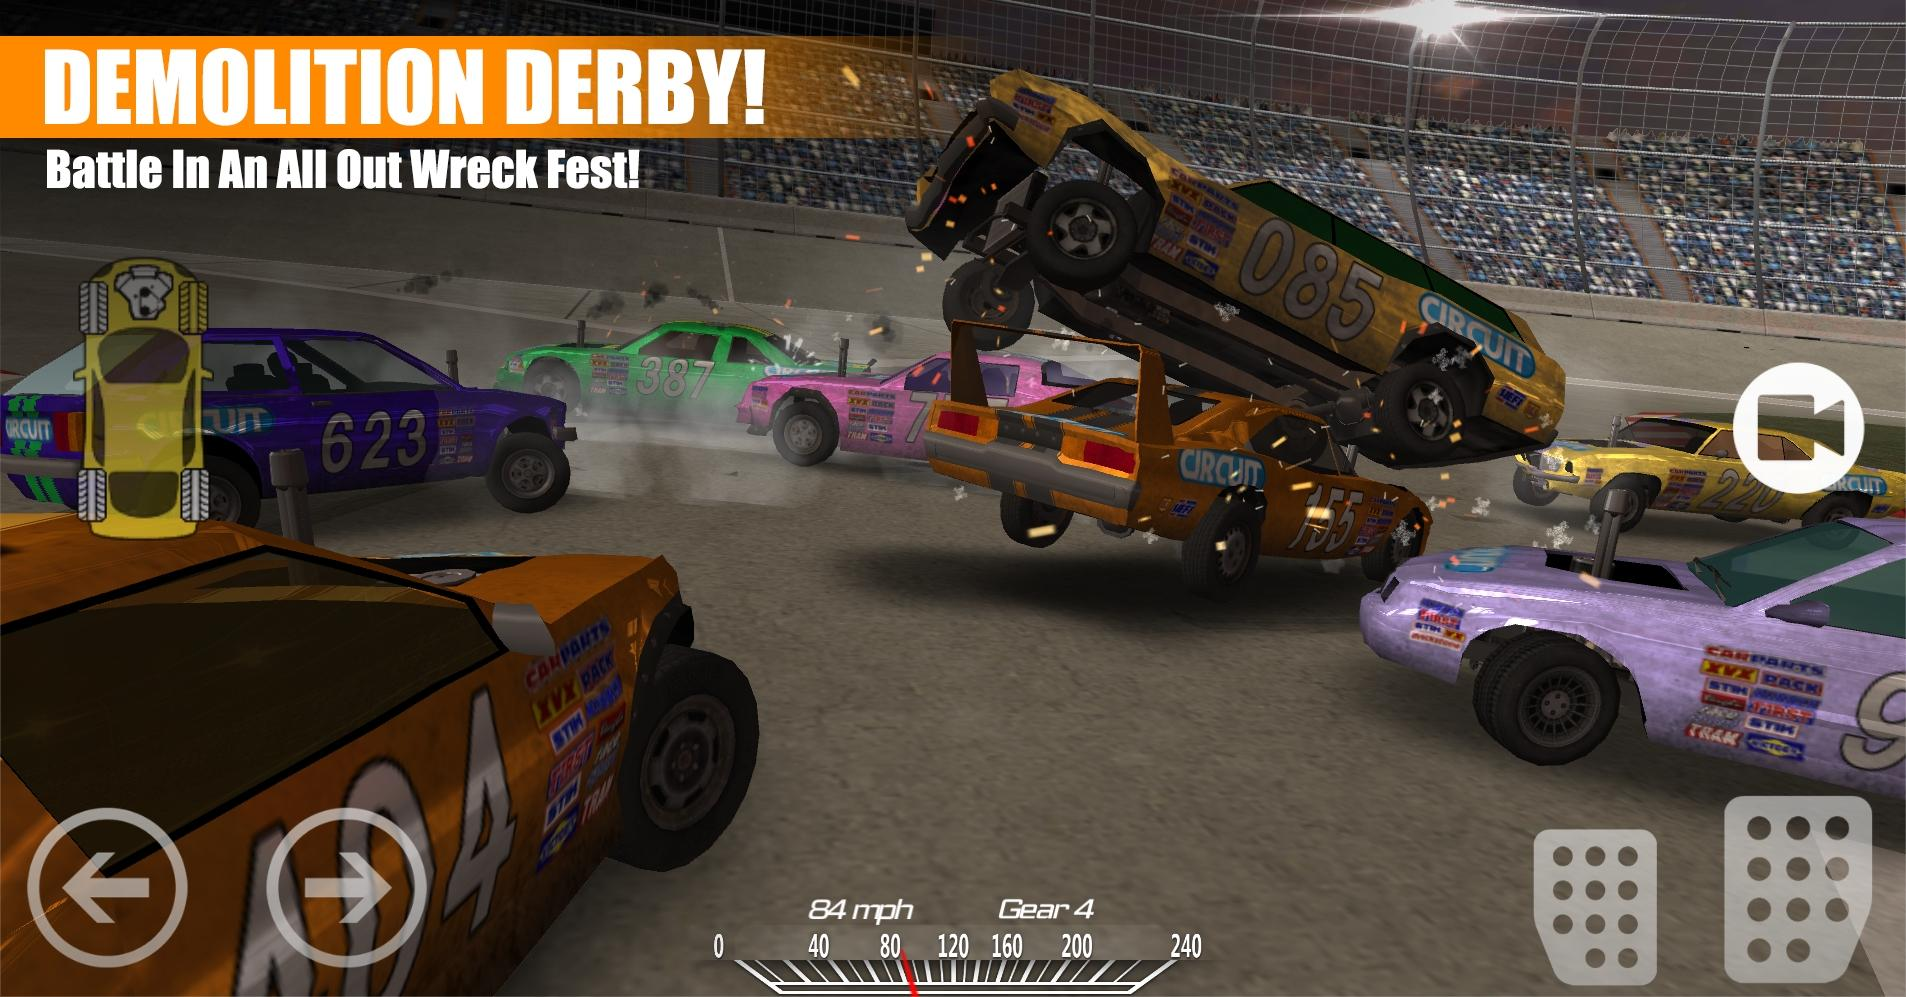 Demolition Derby 2 Mod Apk (Unlimited Money/Coins) 1